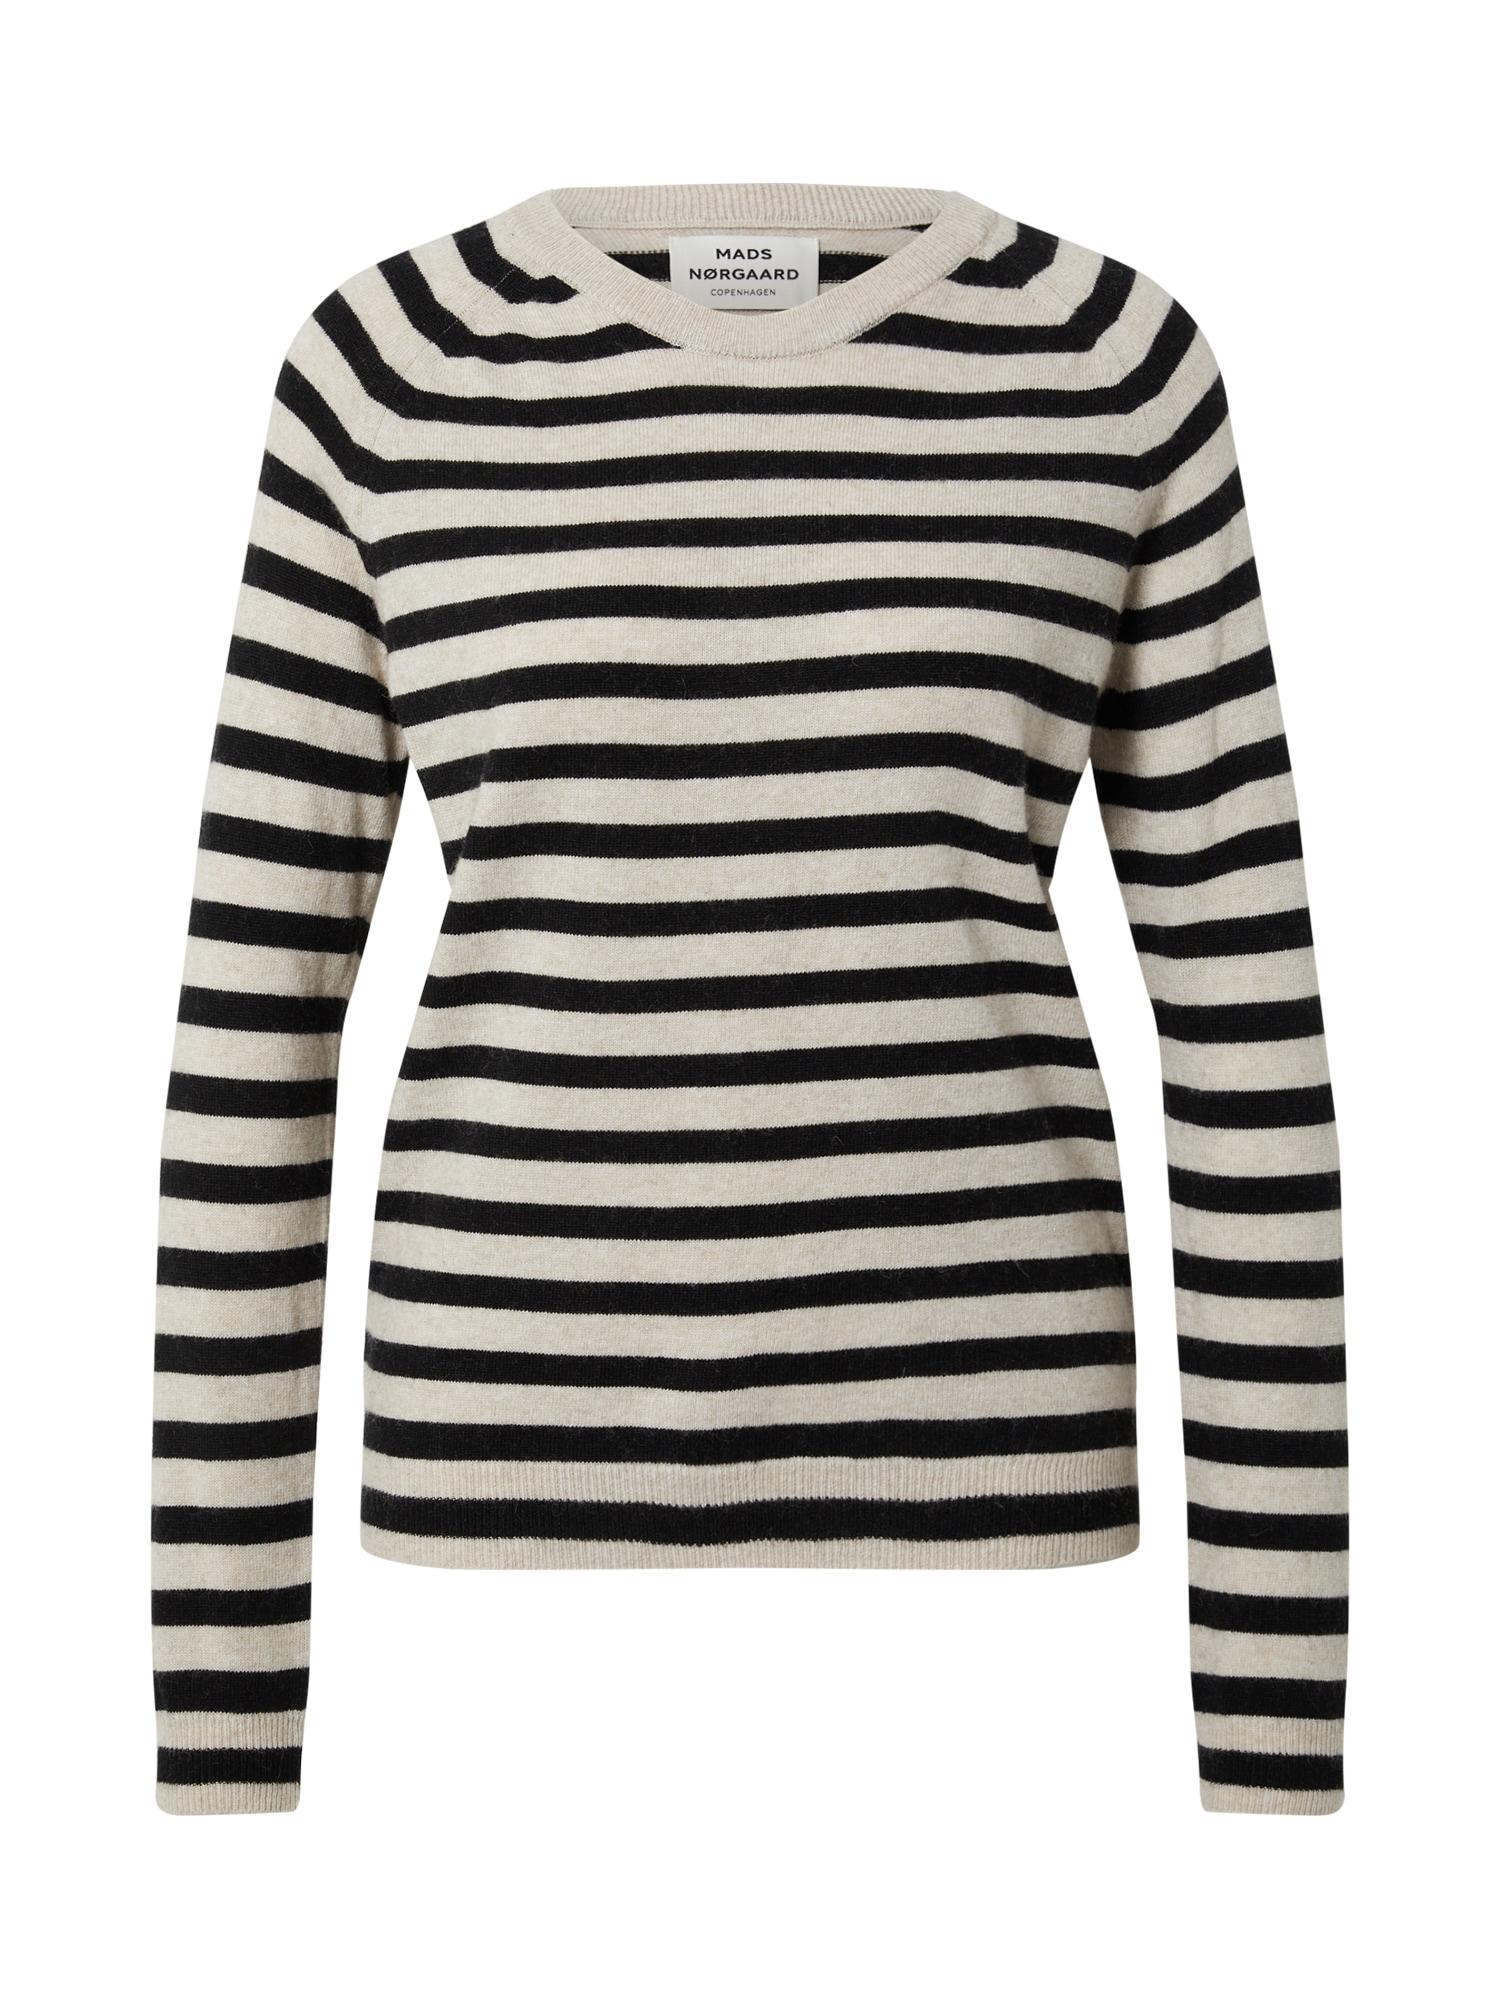 MADS NORGAARD COPENHAGEN Megztinis juoda / smėlio spalva